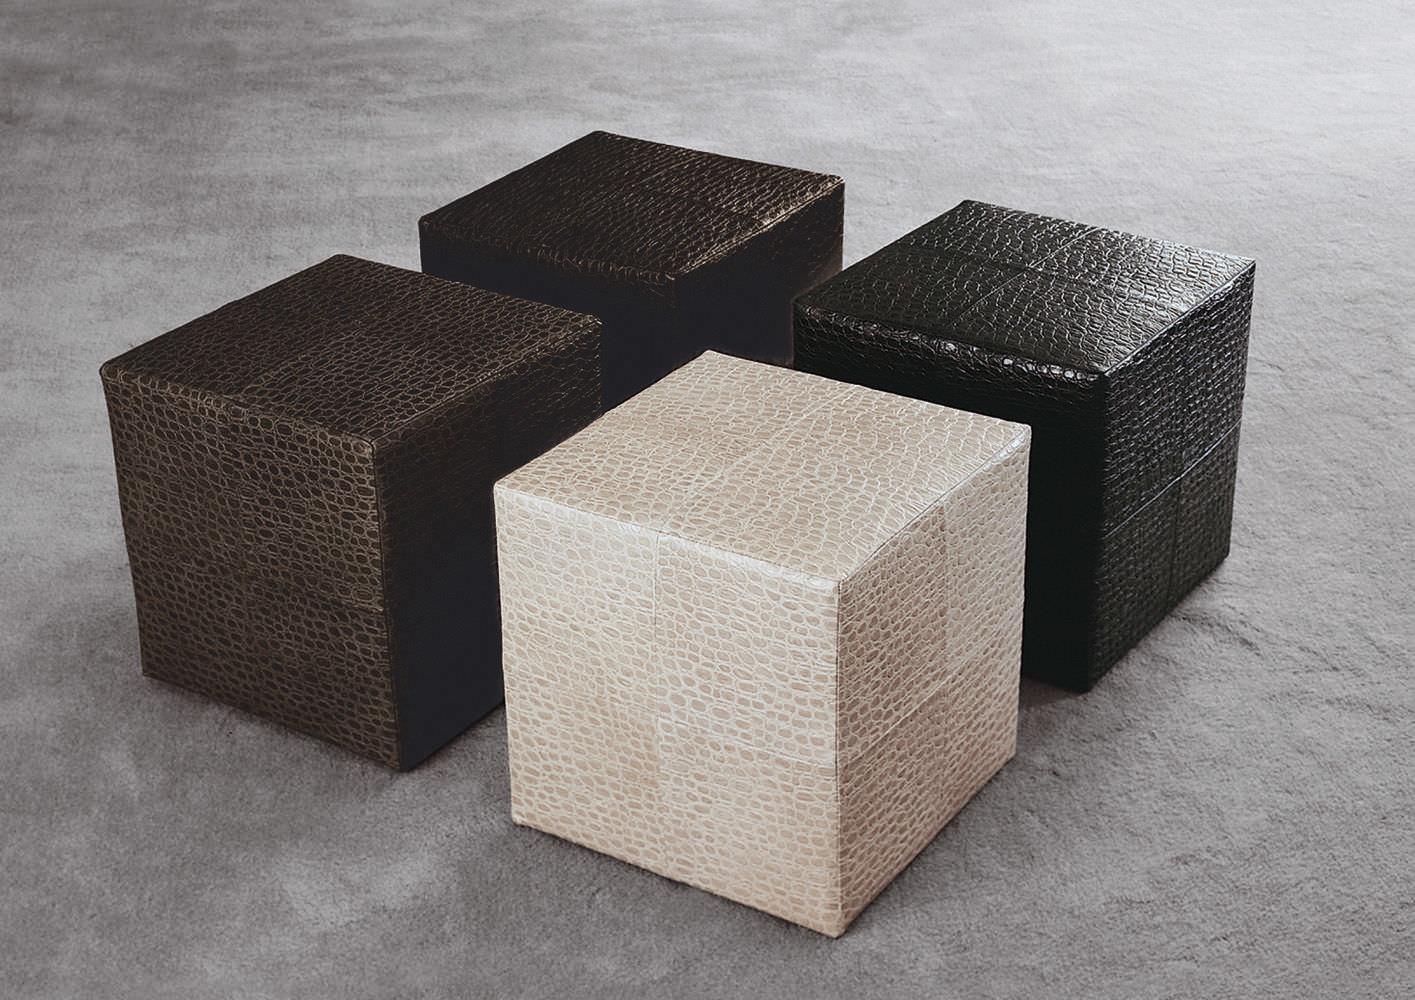 Pouf contemporain / en cuir / par Rodolfo Dordoni - VILLON - Minotti